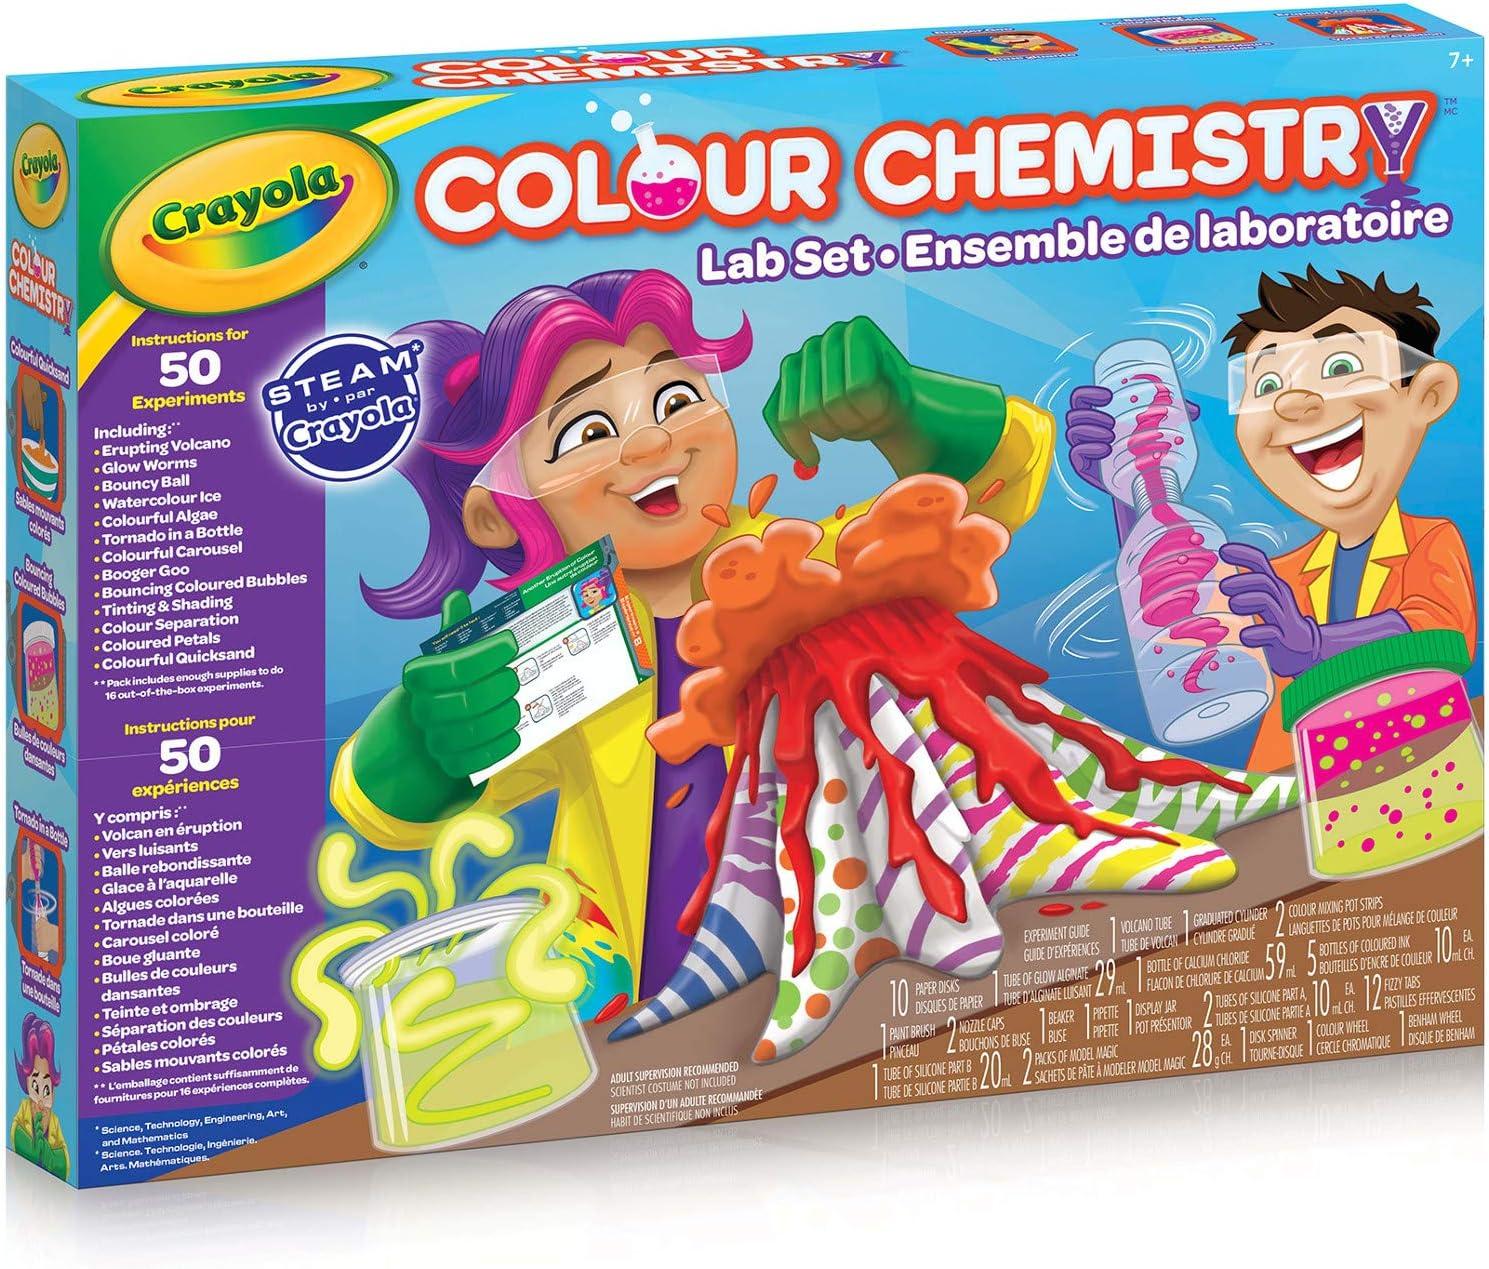 STEM Toys Colour Chemistry Lab